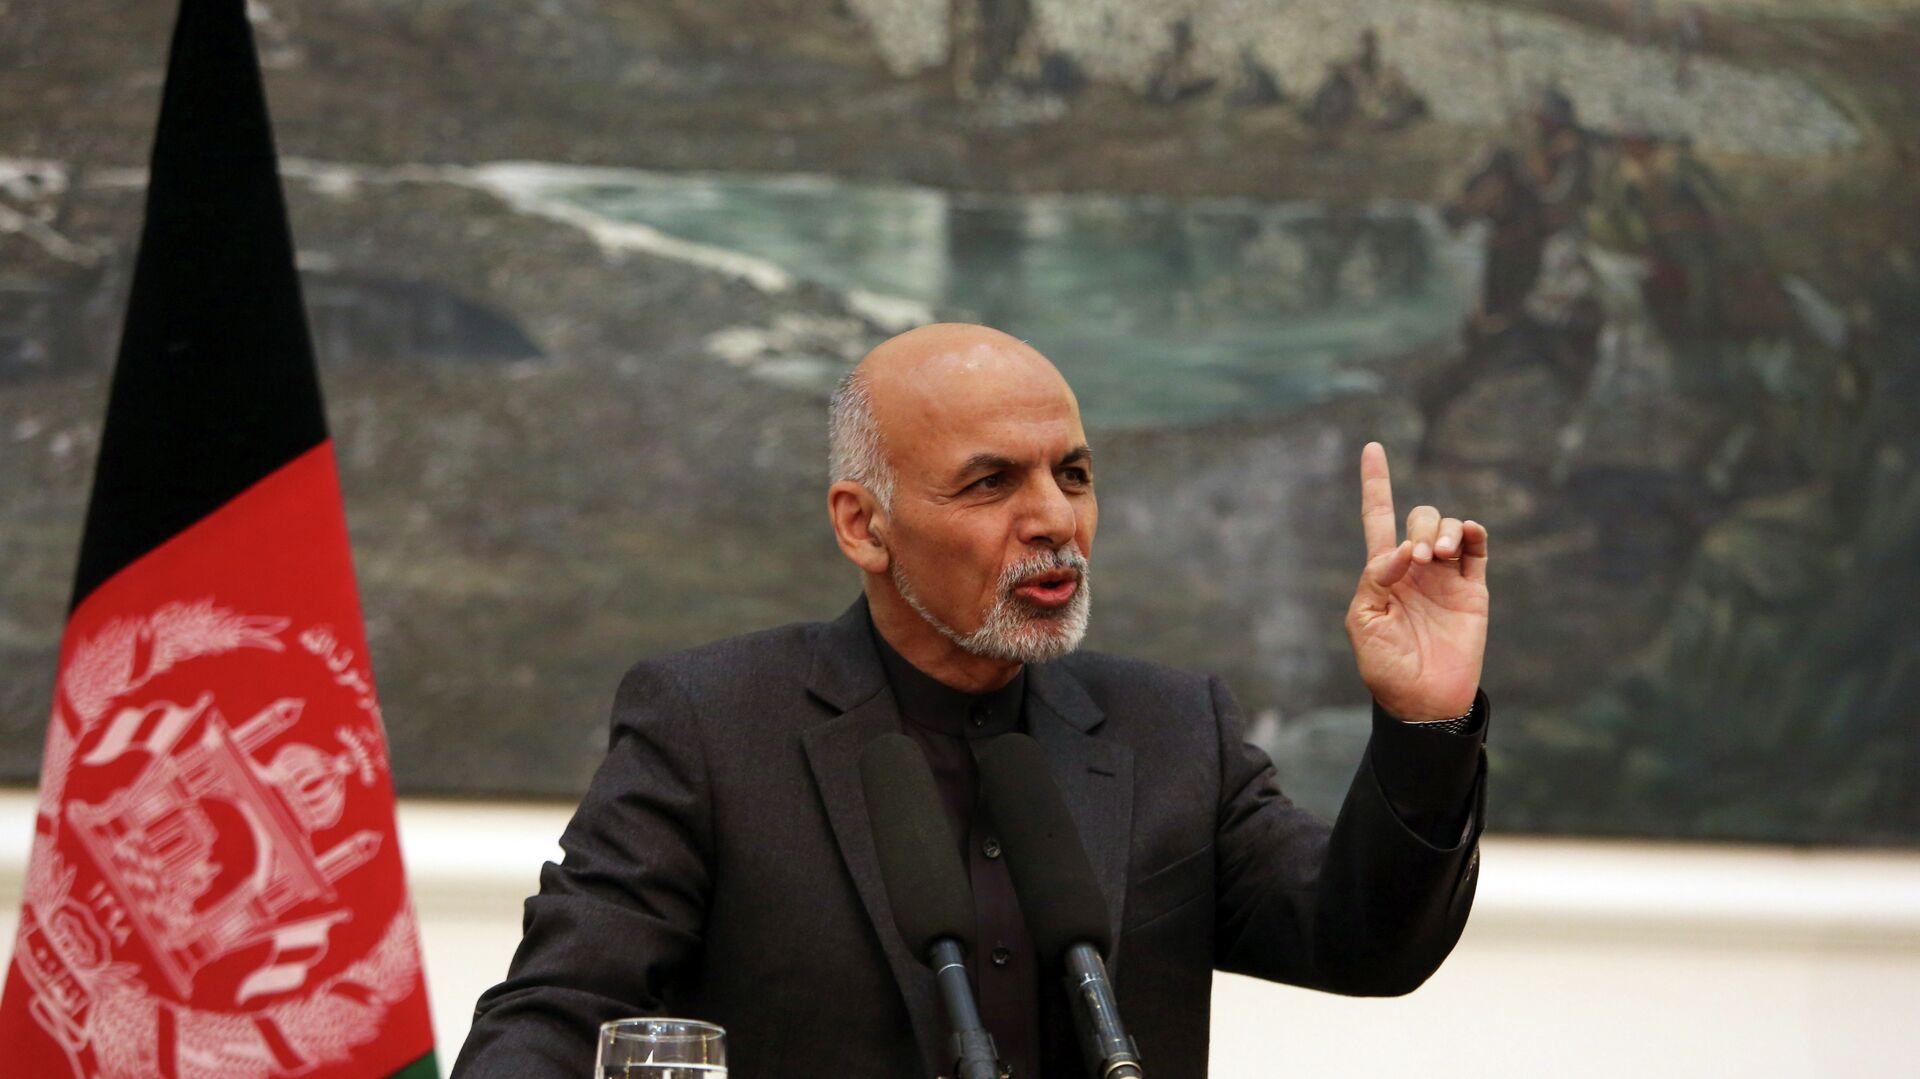 El presidente afgano, Ashraf Ghani - Sputnik Mundo, 1920, 08.09.2021